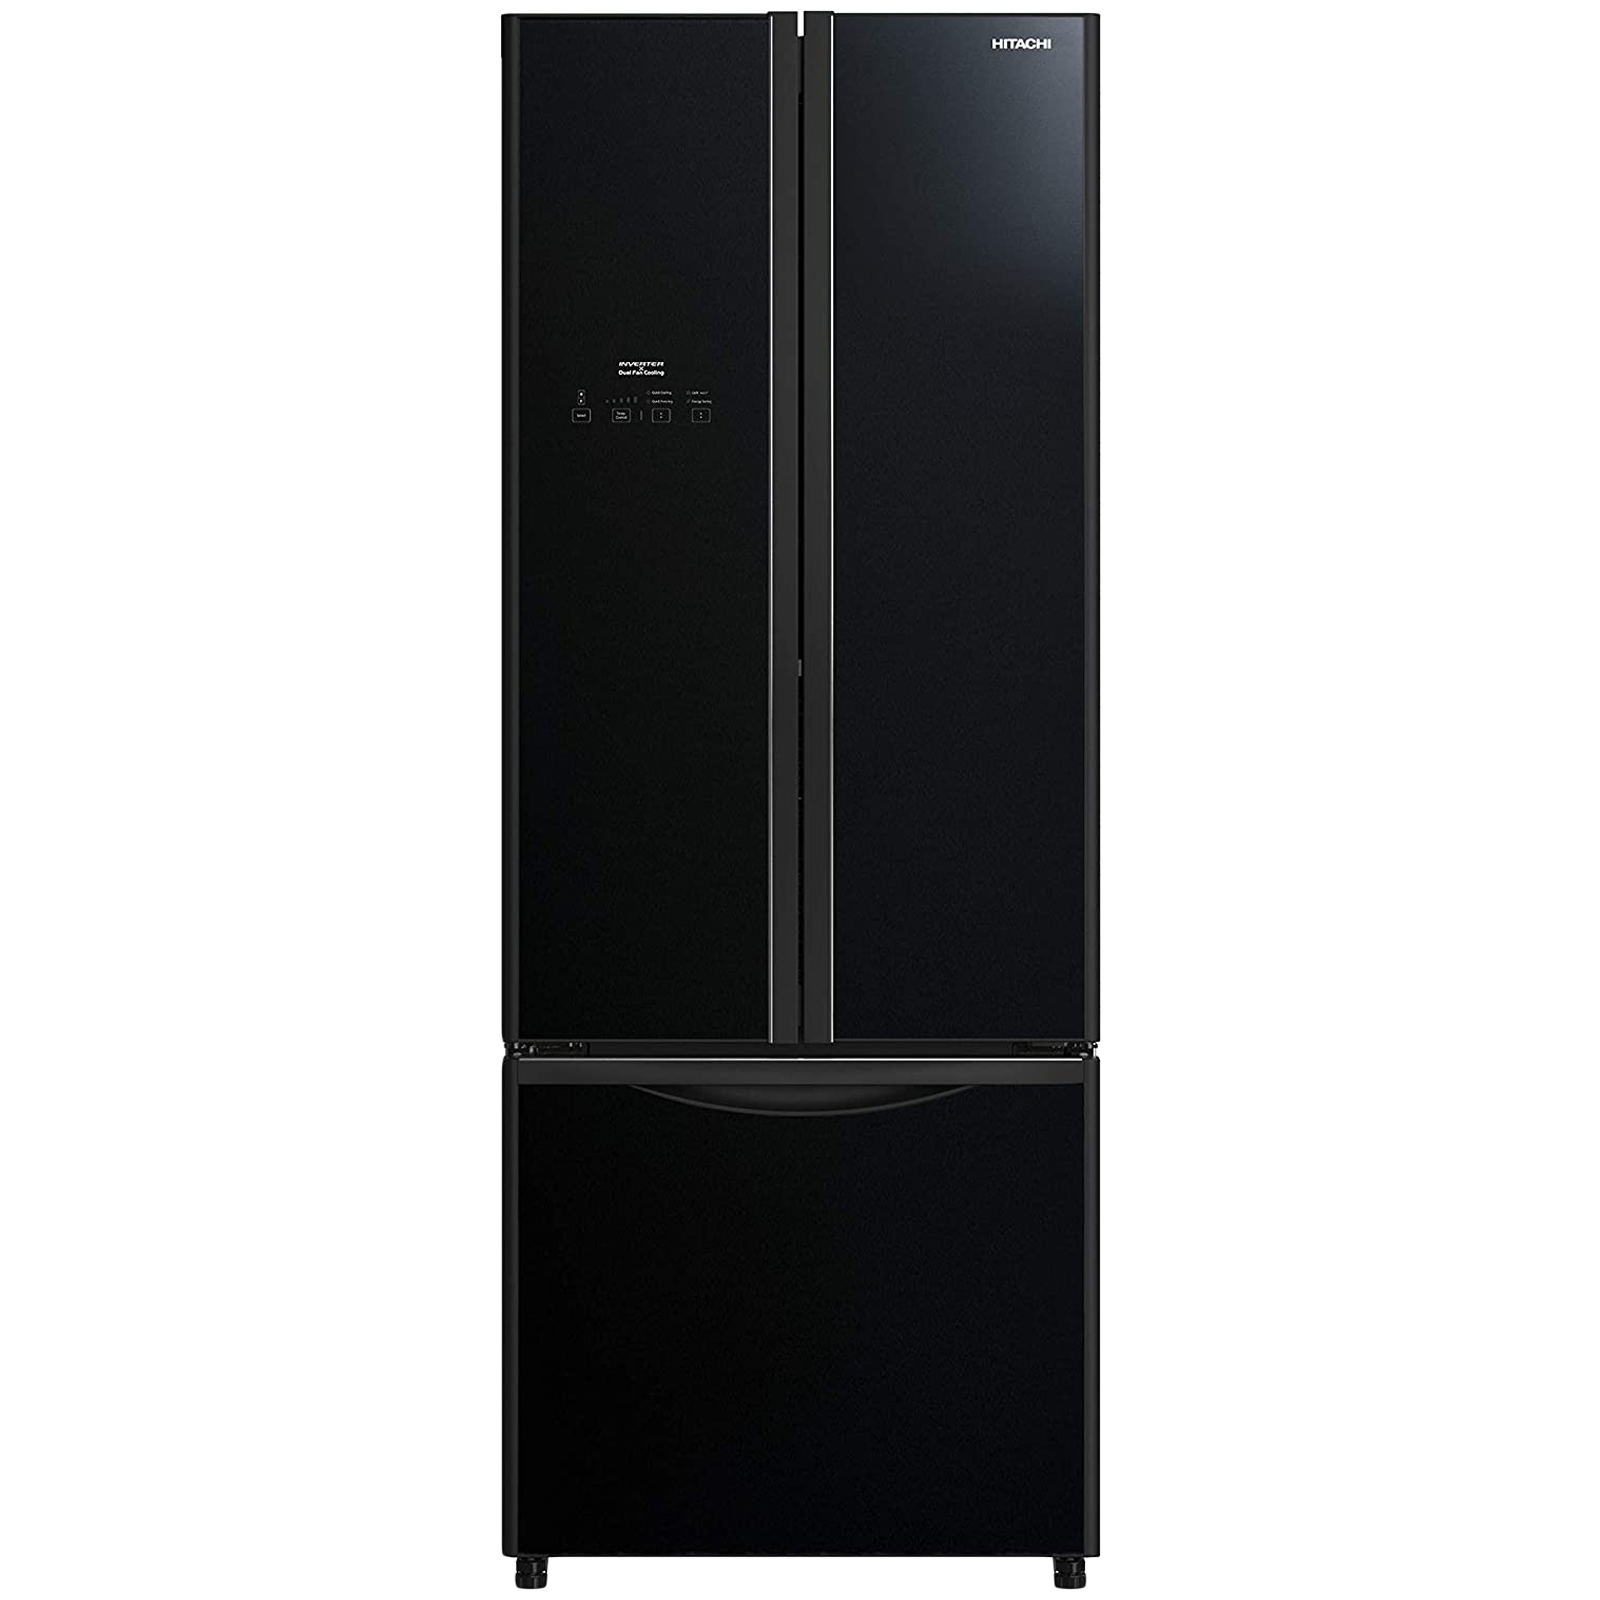 Hitachi 510 Litres Frost Free Inverter French Door Refrigerator (Nano Titanium Filter, R-WB560PND9, Glass Black)_1